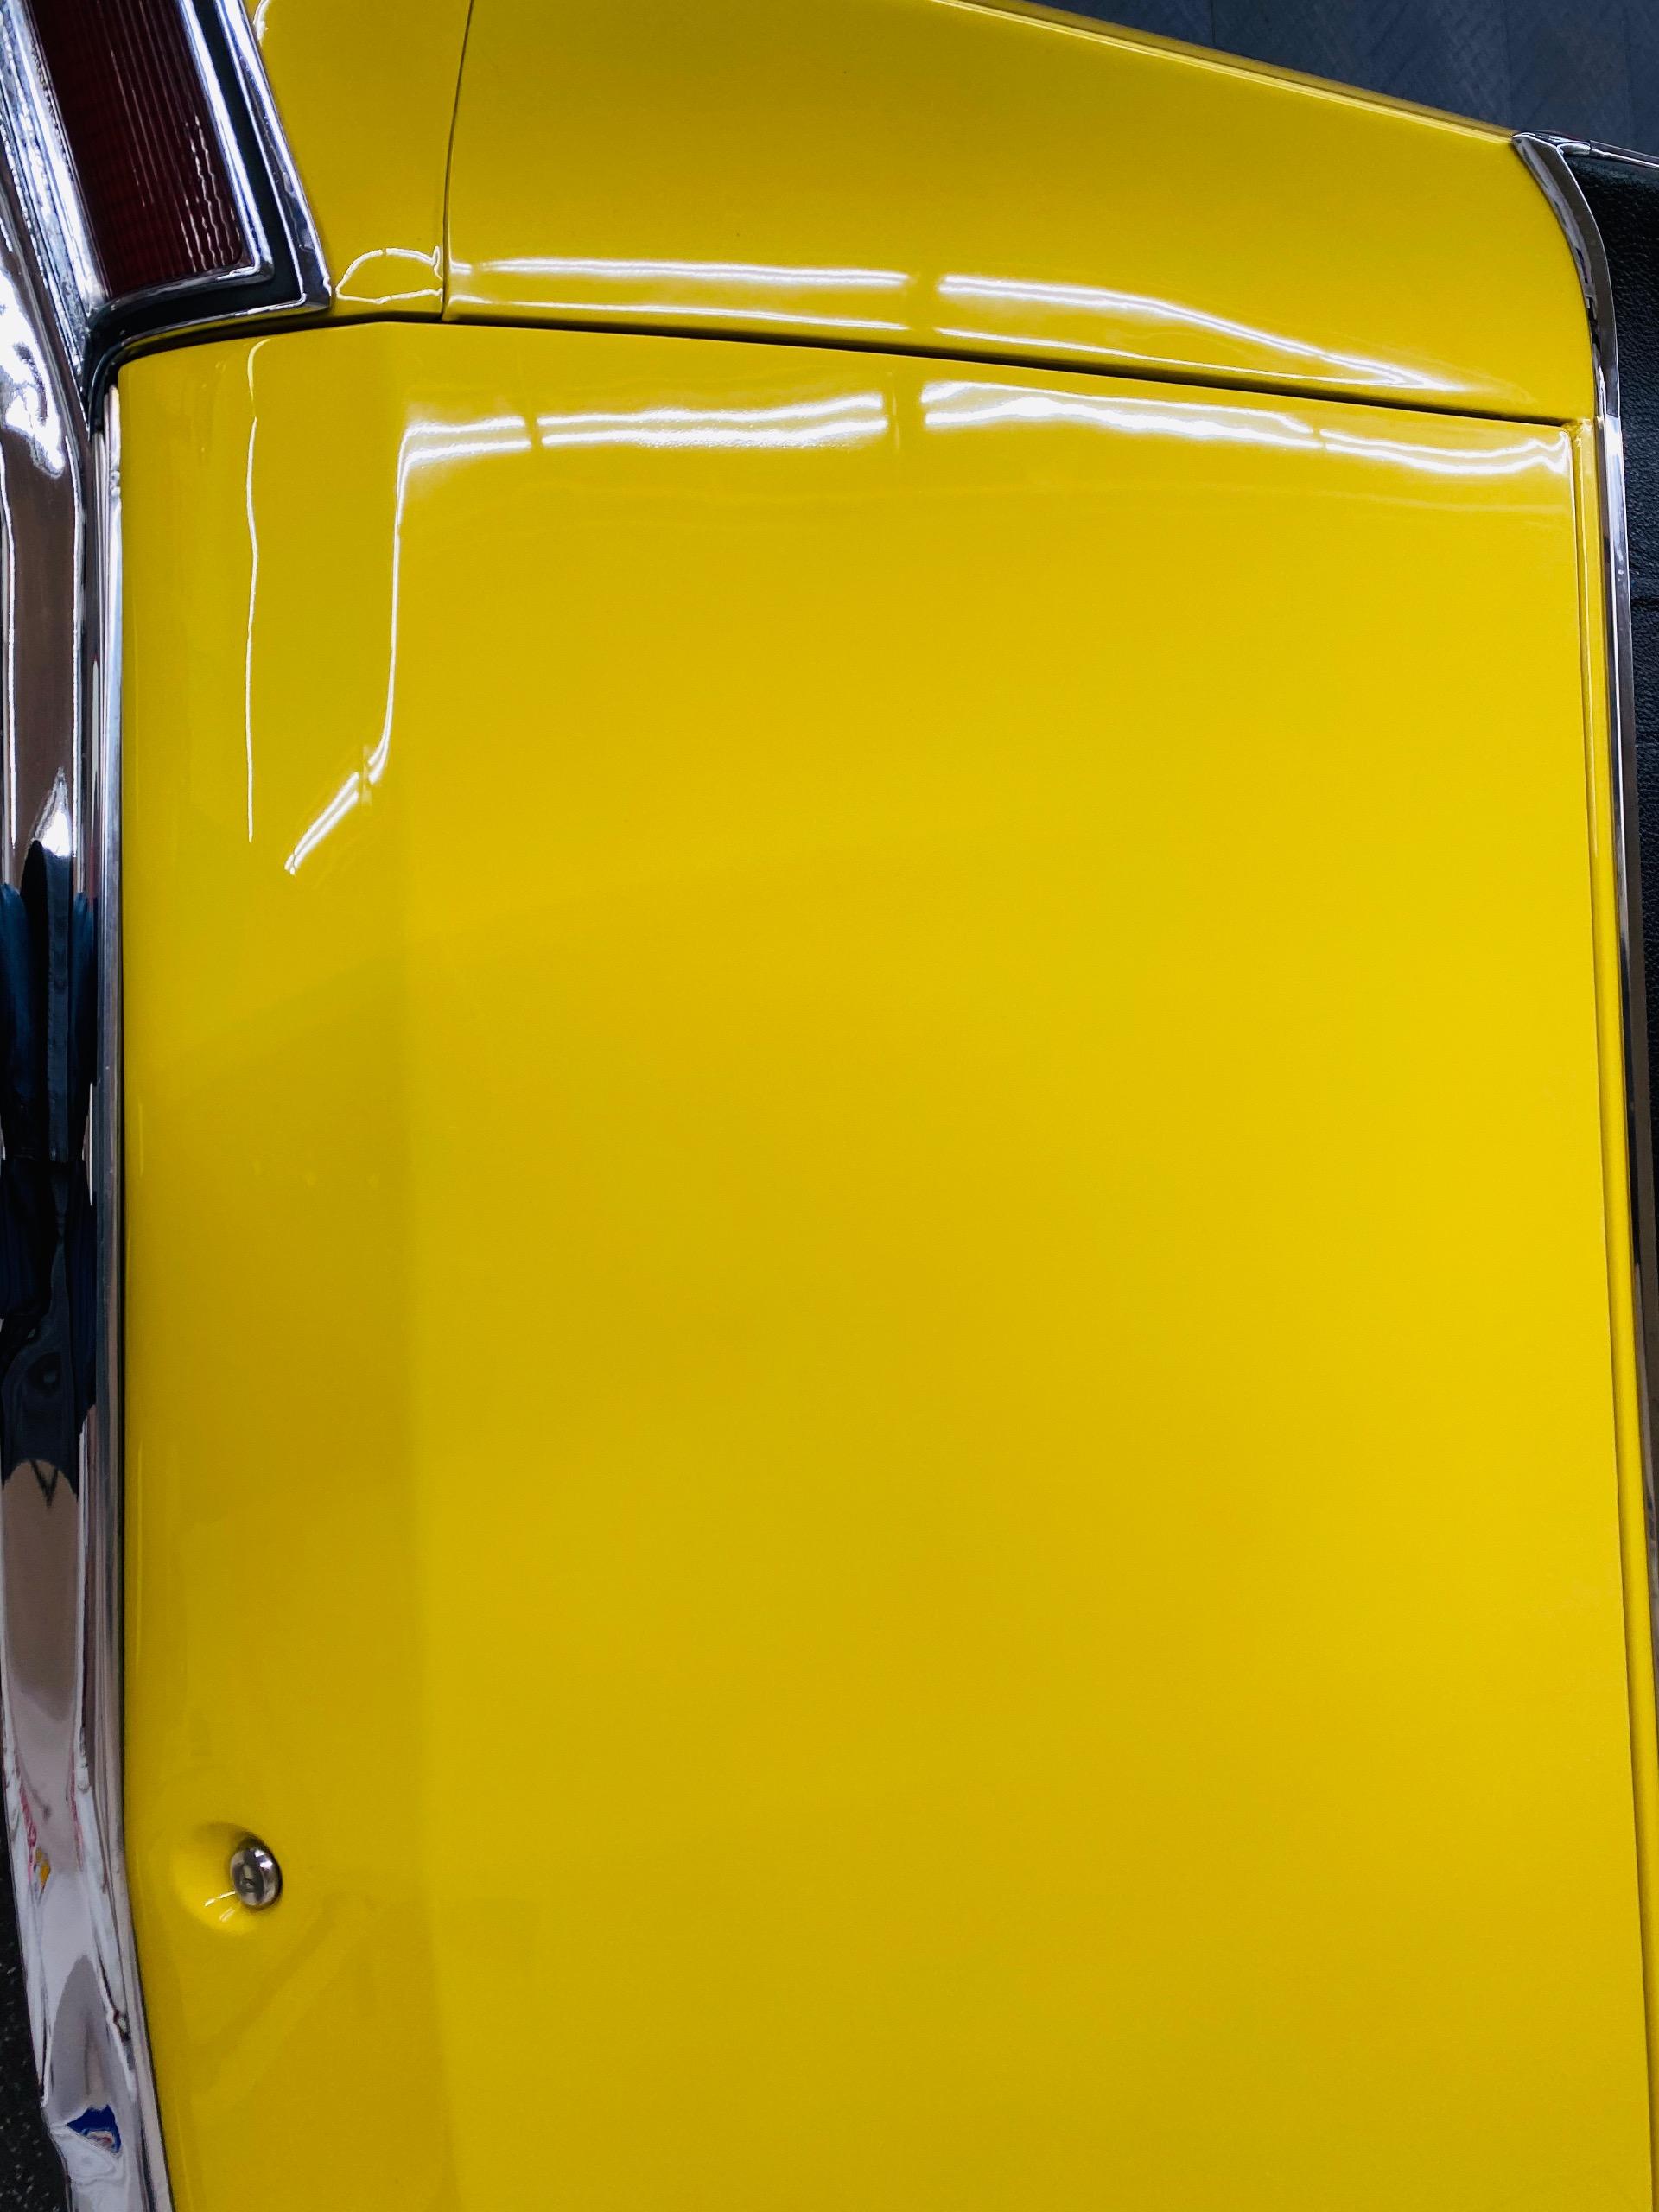 Used 1969 Chevrolet Chevelle - SUPER SPORT - 396 ENGINE - 4 SPEED - SEE VIDEO | Mundelein, IL